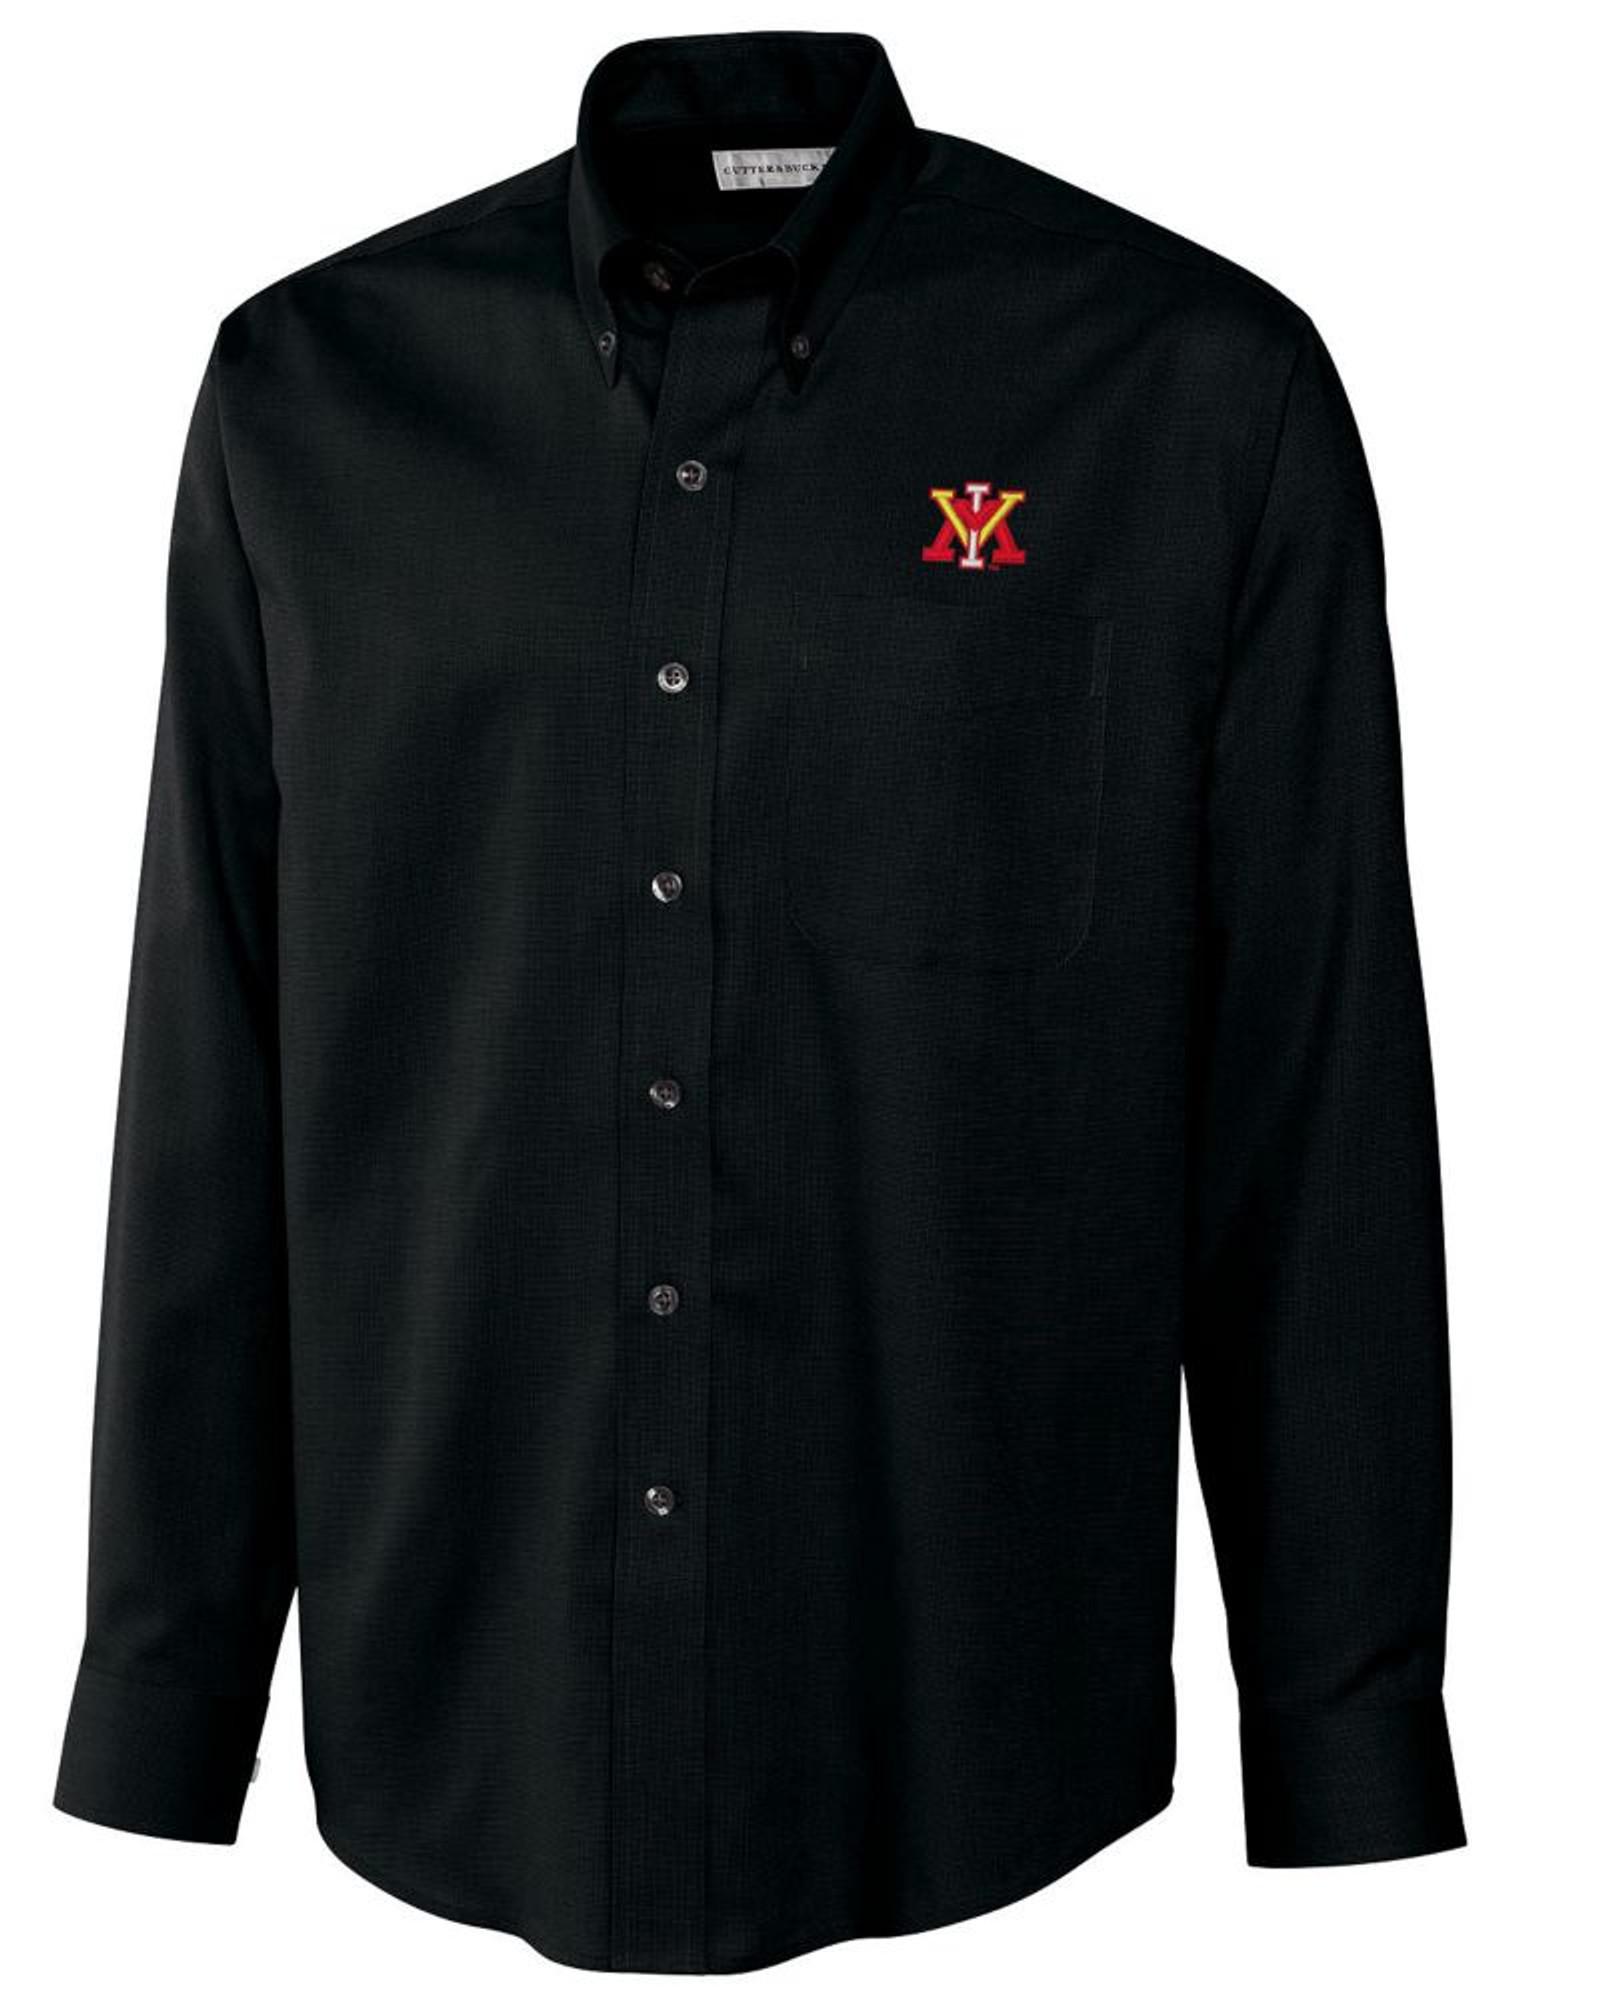 559ec18509c518 Virginia Military Institute Men's Long Sleeve Nailshead Woven Shirt